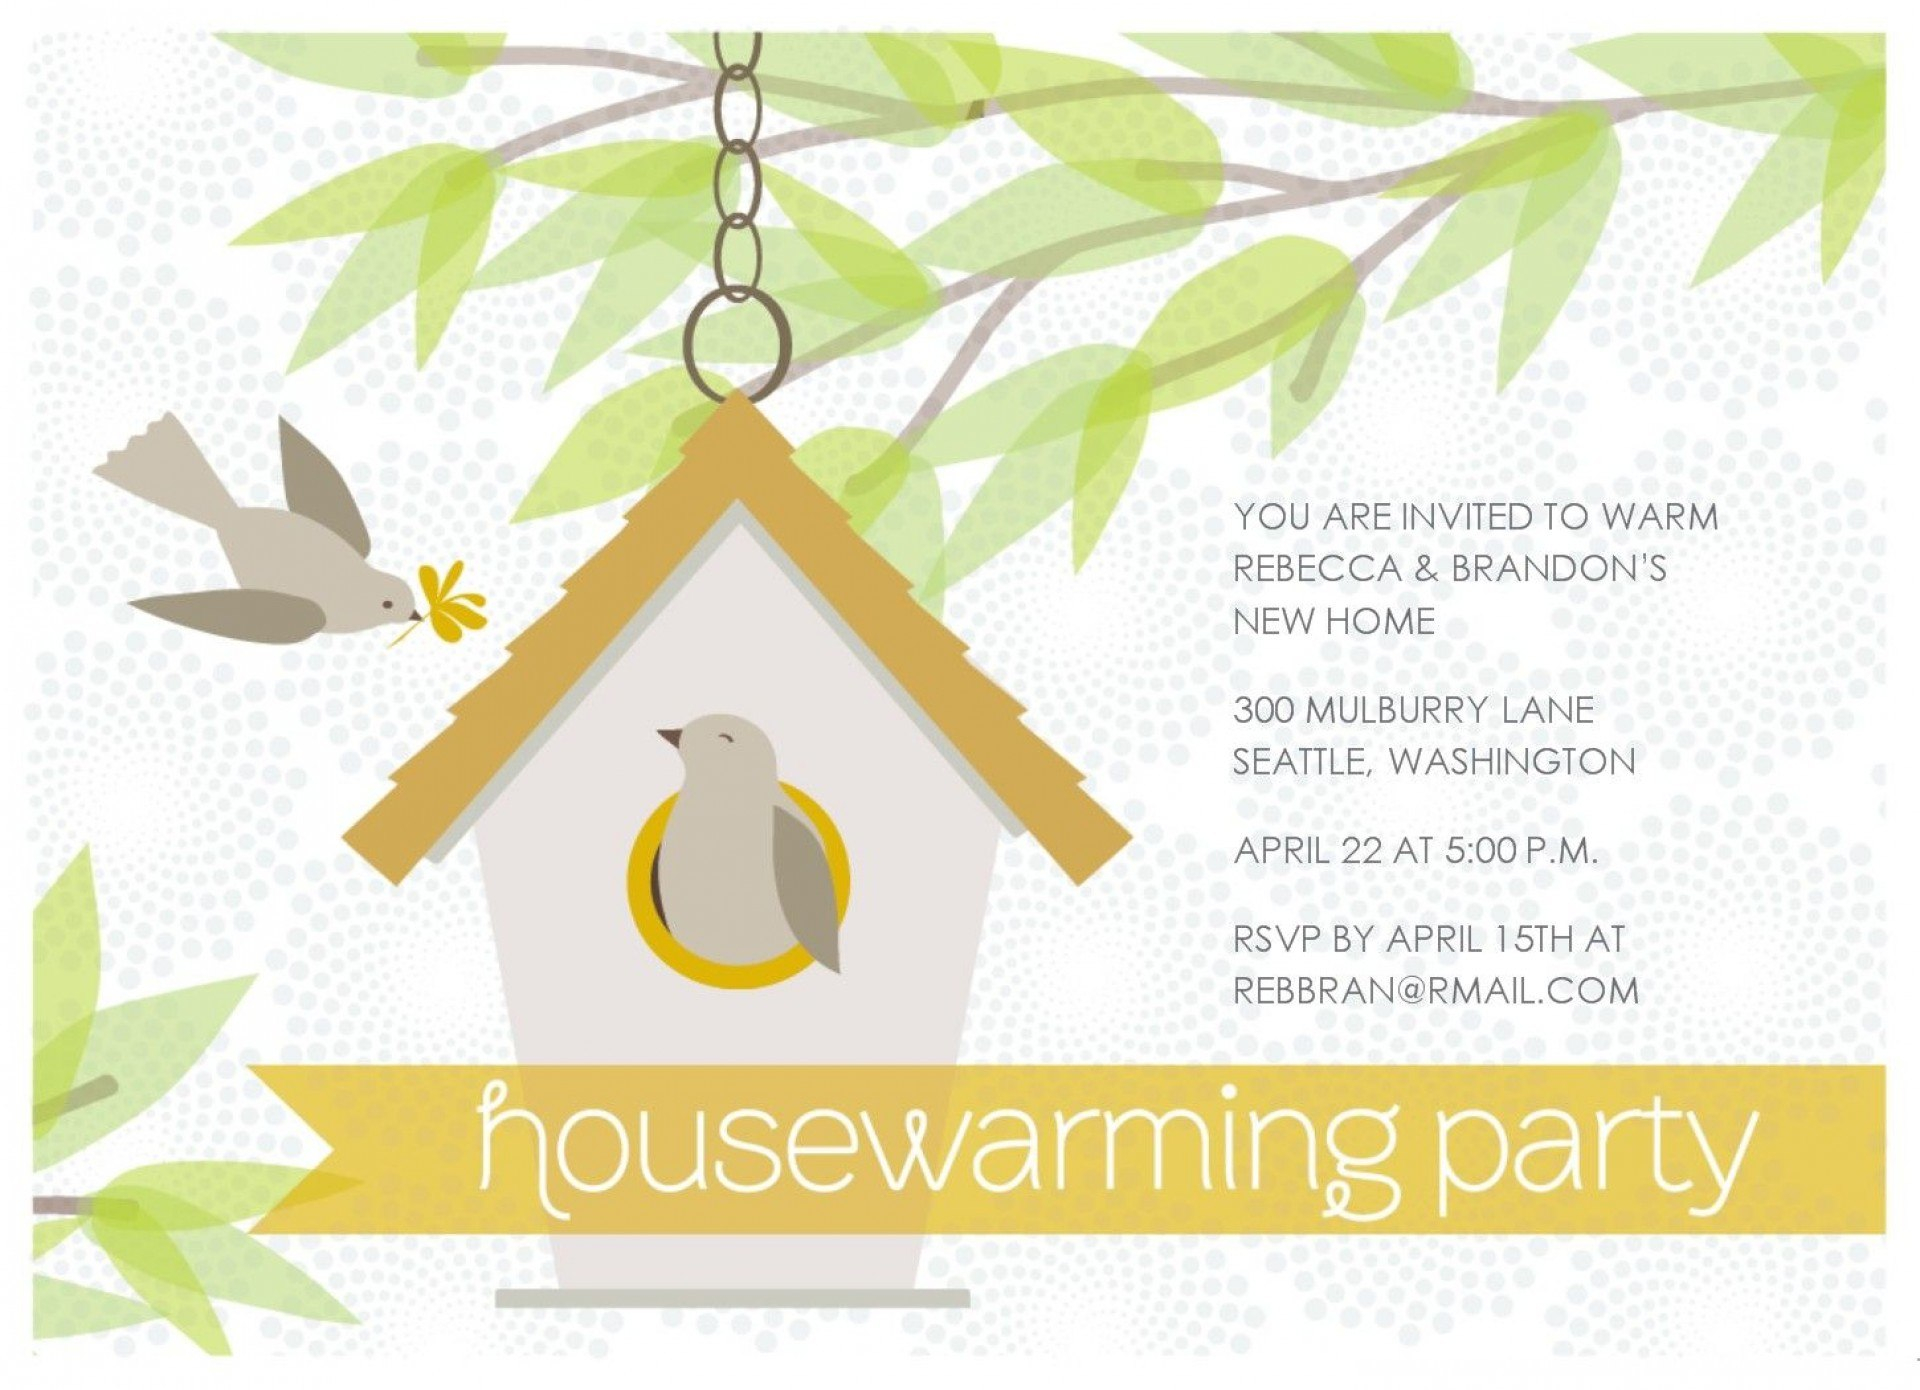 Template Ideas Free Housewarming Invitation Awesome Templates Inside Free Housewarming Invitation Card Template